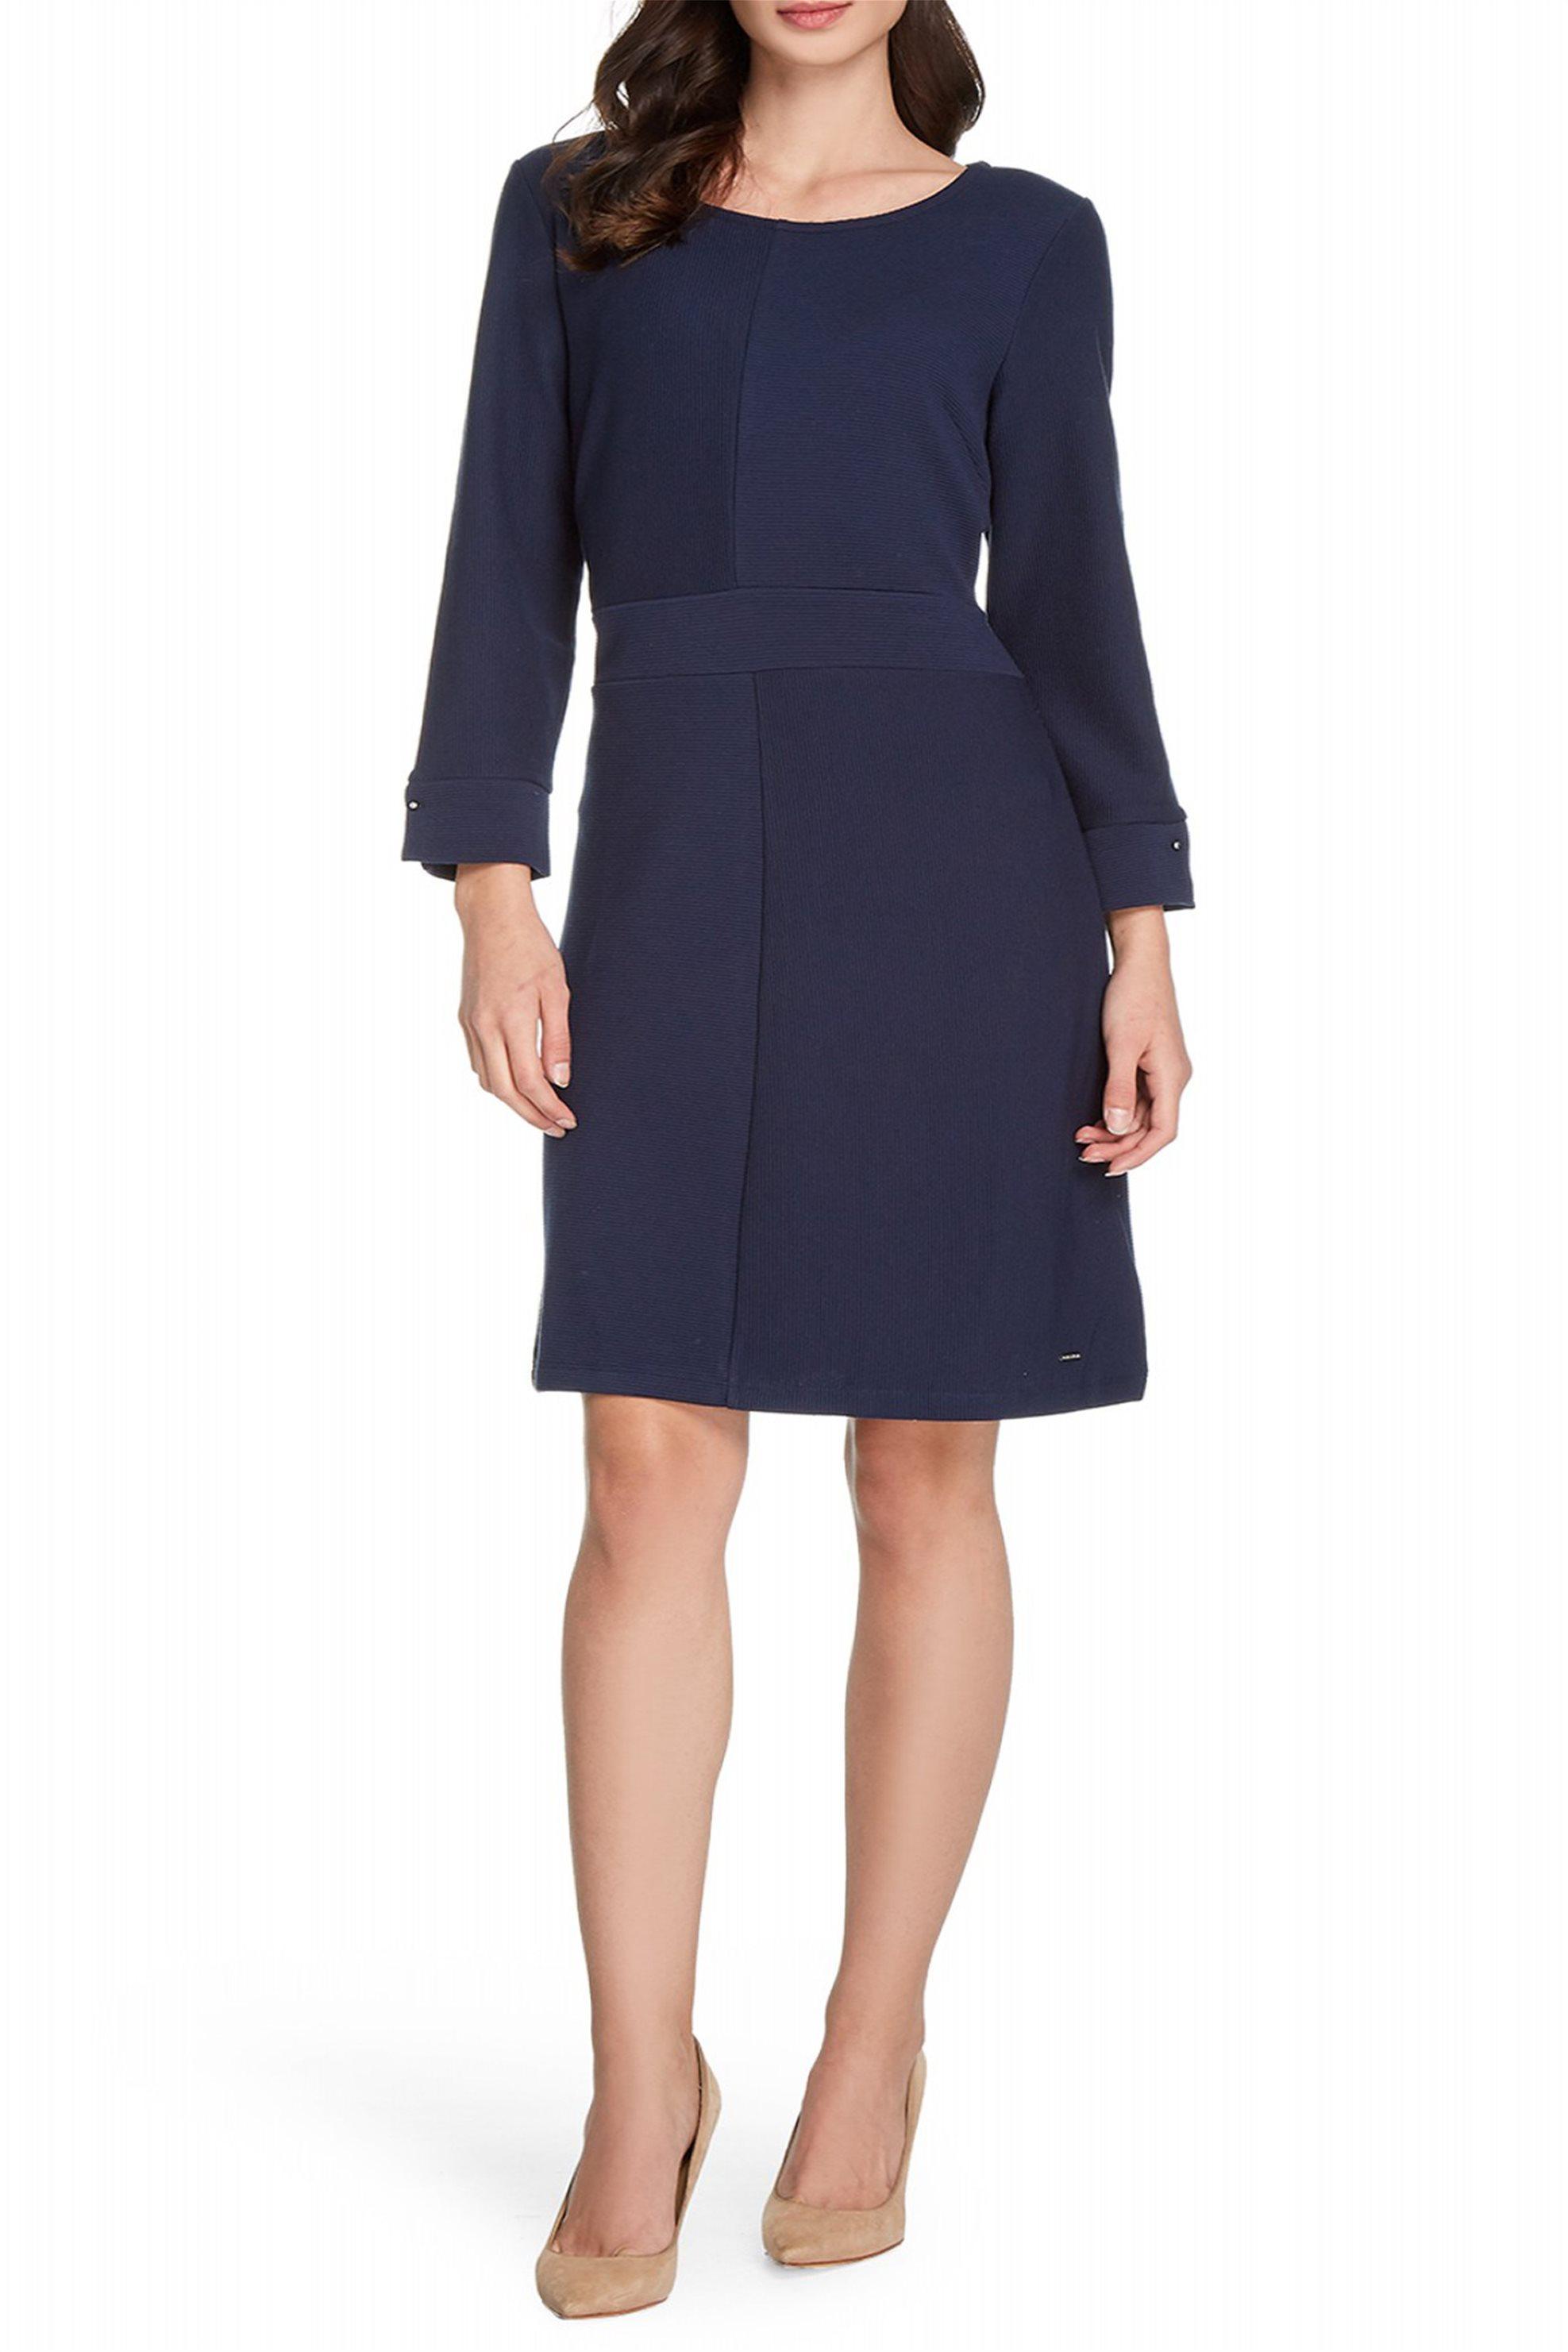 Nautica γυναικείο mini φόρεμα με λεπτομέρεια στην μανσέτα - 83D220 - Μπλε Σκούρο γυναικα   ρουχα   φορέματα   mini φορέματα